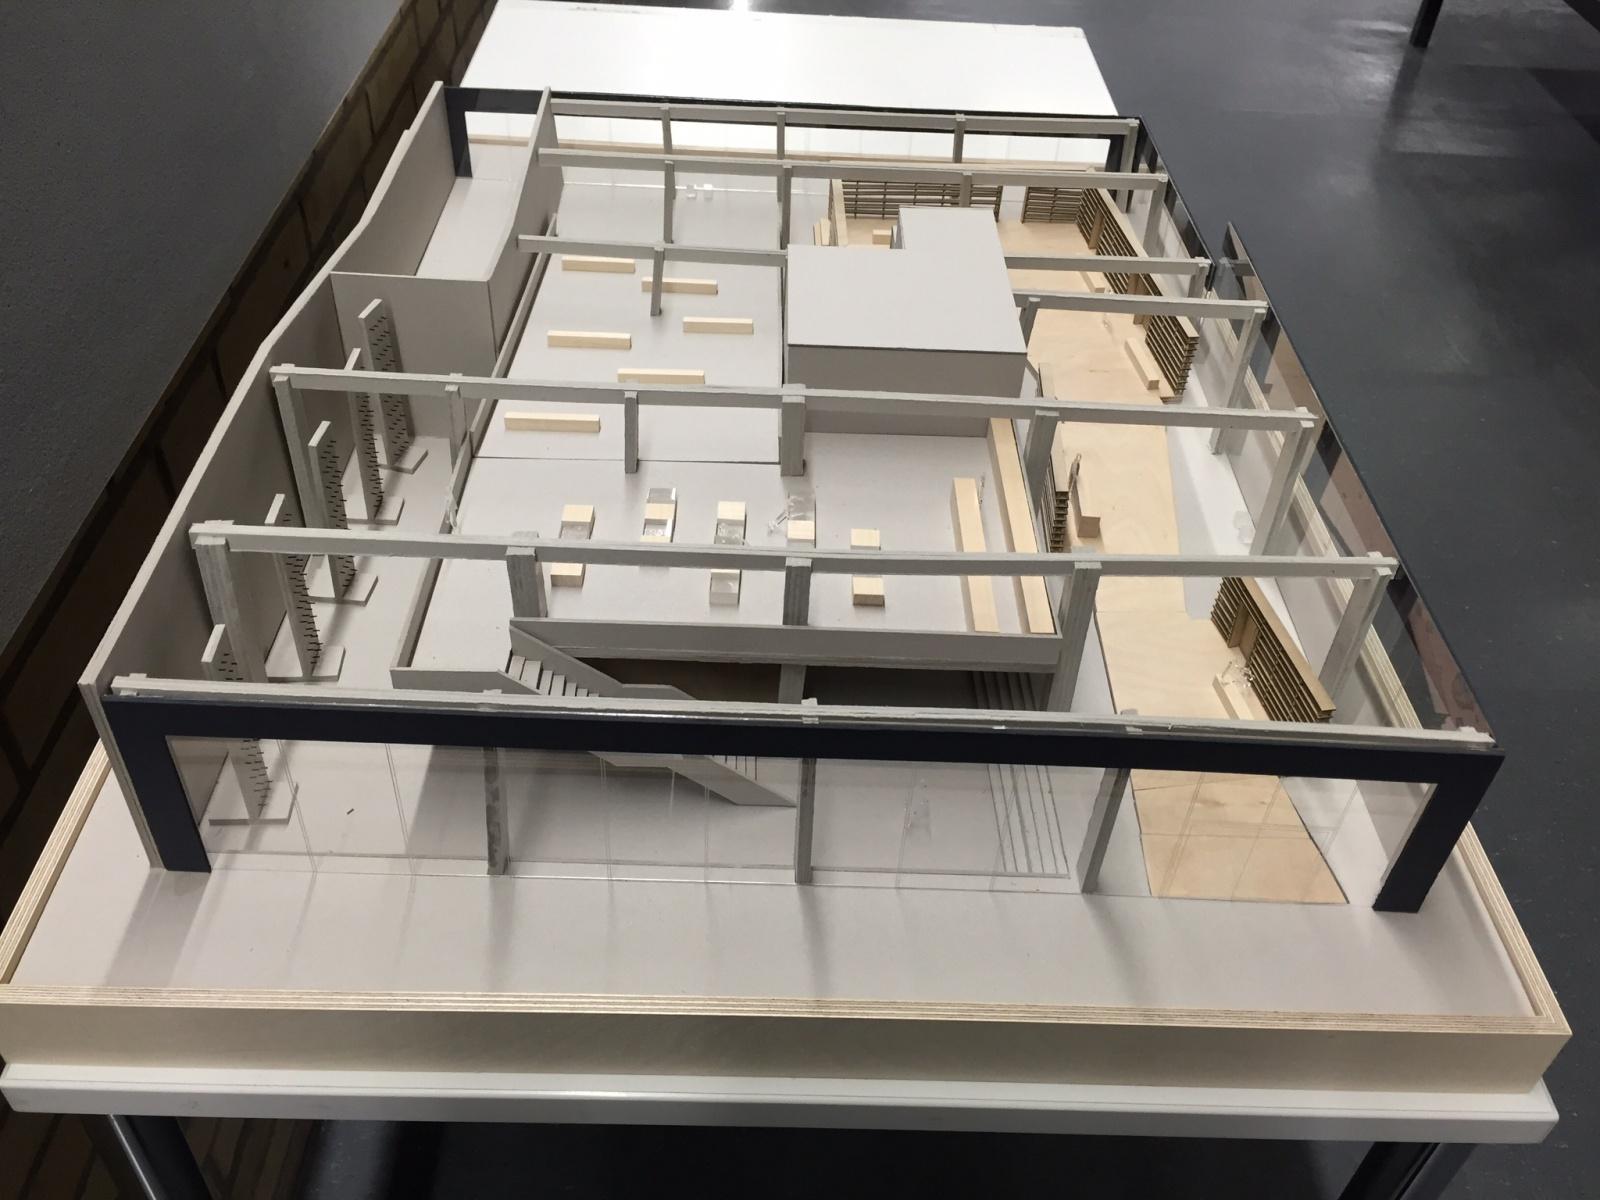 bdiausgezeichnet bachelor f r dominique fritsches flagshipstore converse in berlin und. Black Bedroom Furniture Sets. Home Design Ideas